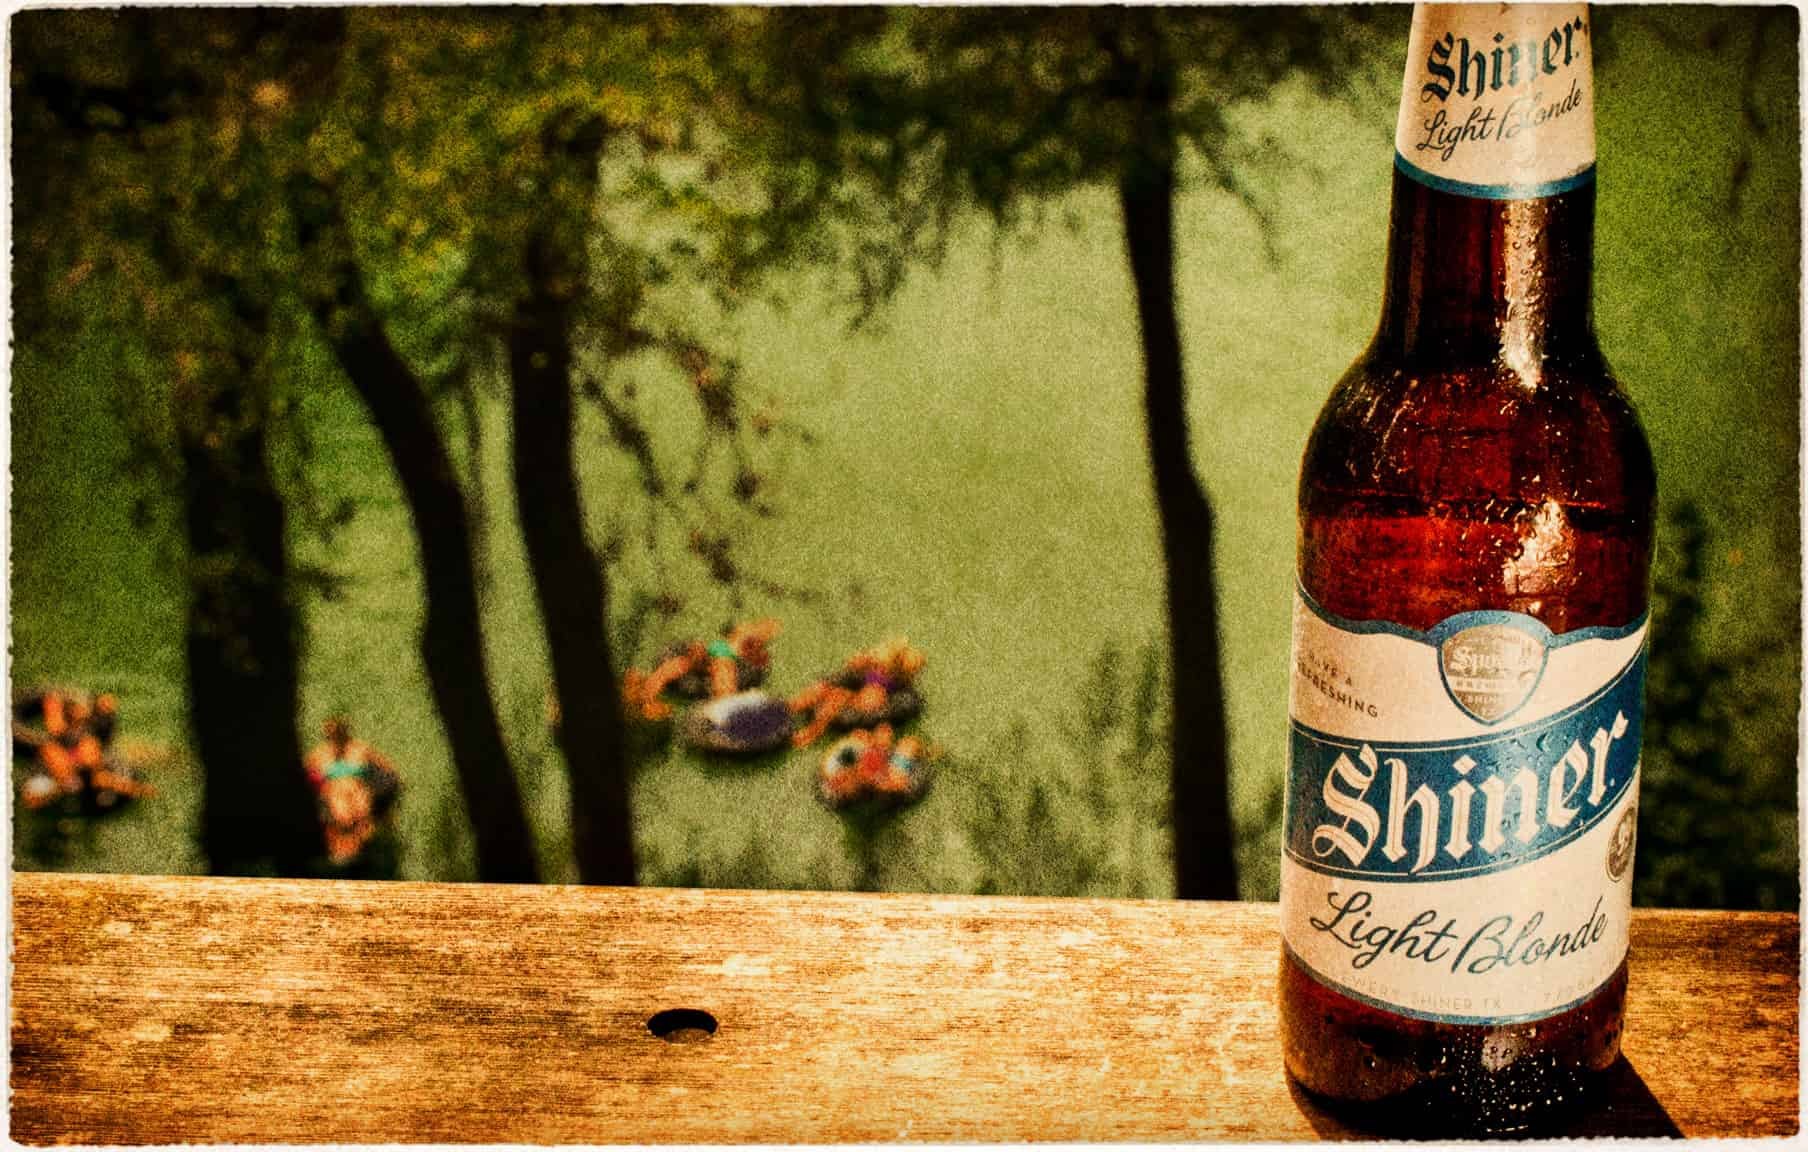 Shiner Light Beer